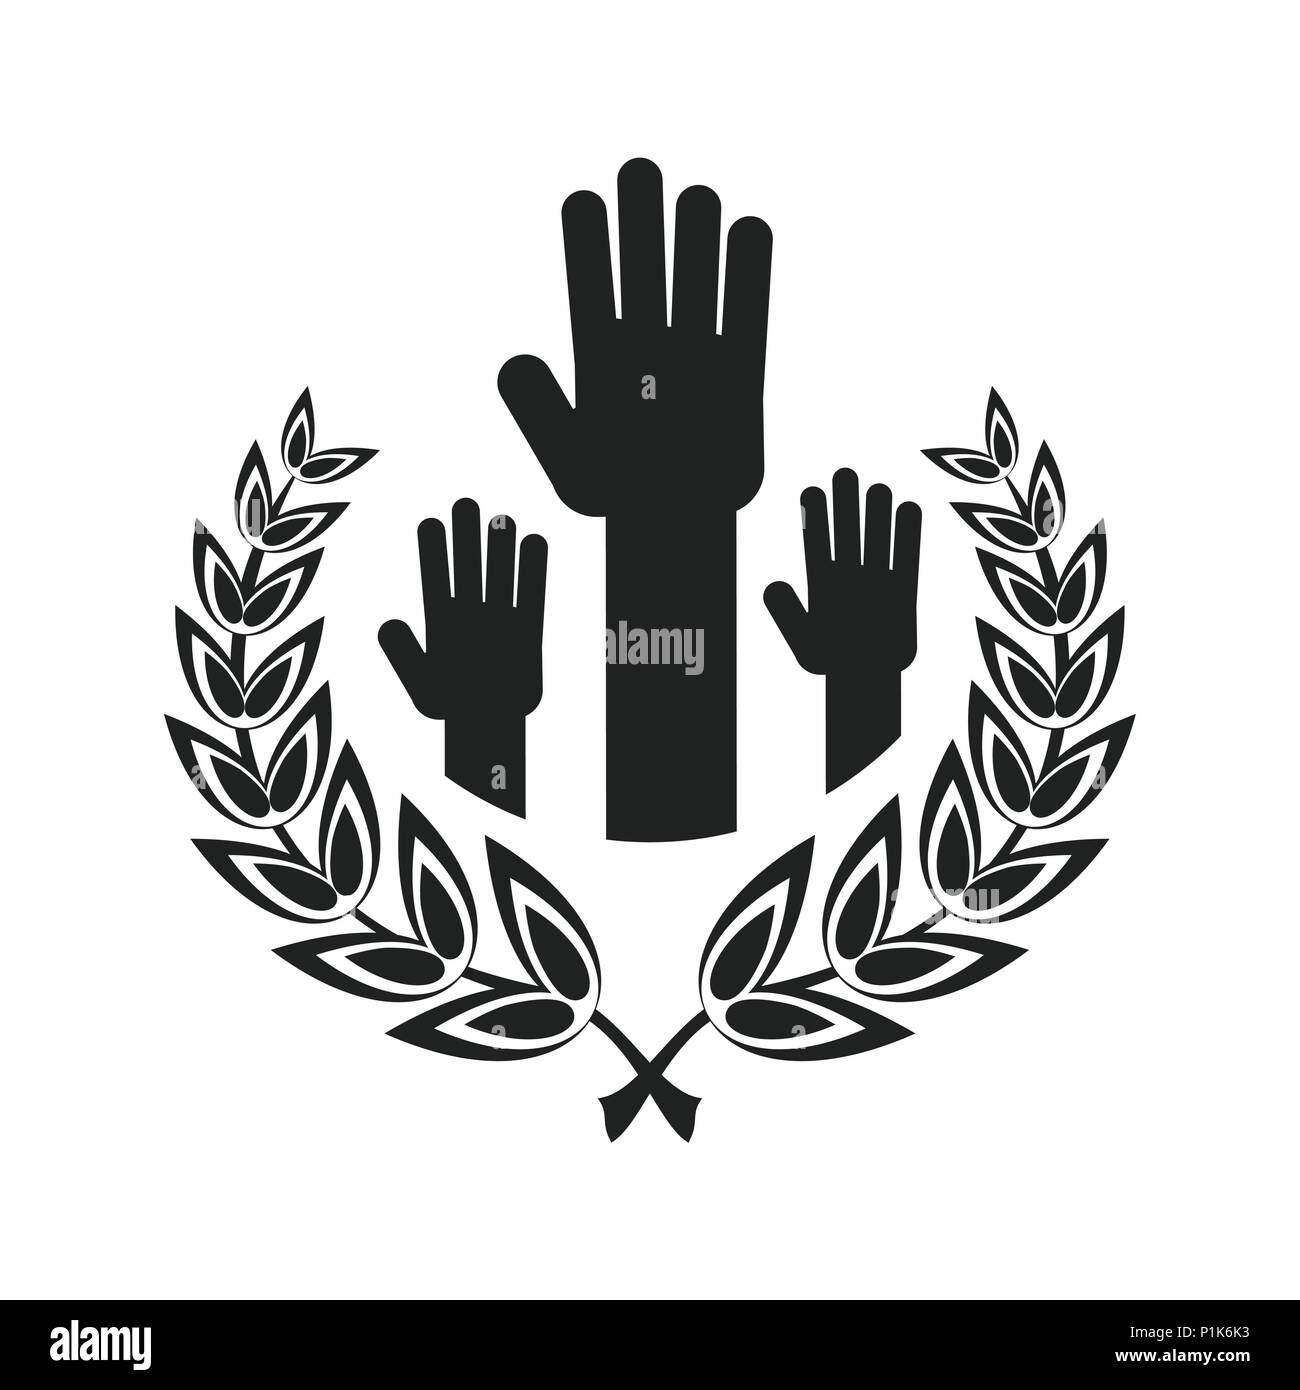 Unity Handpalm Heart Logo Stock Vector Image Art Alamy